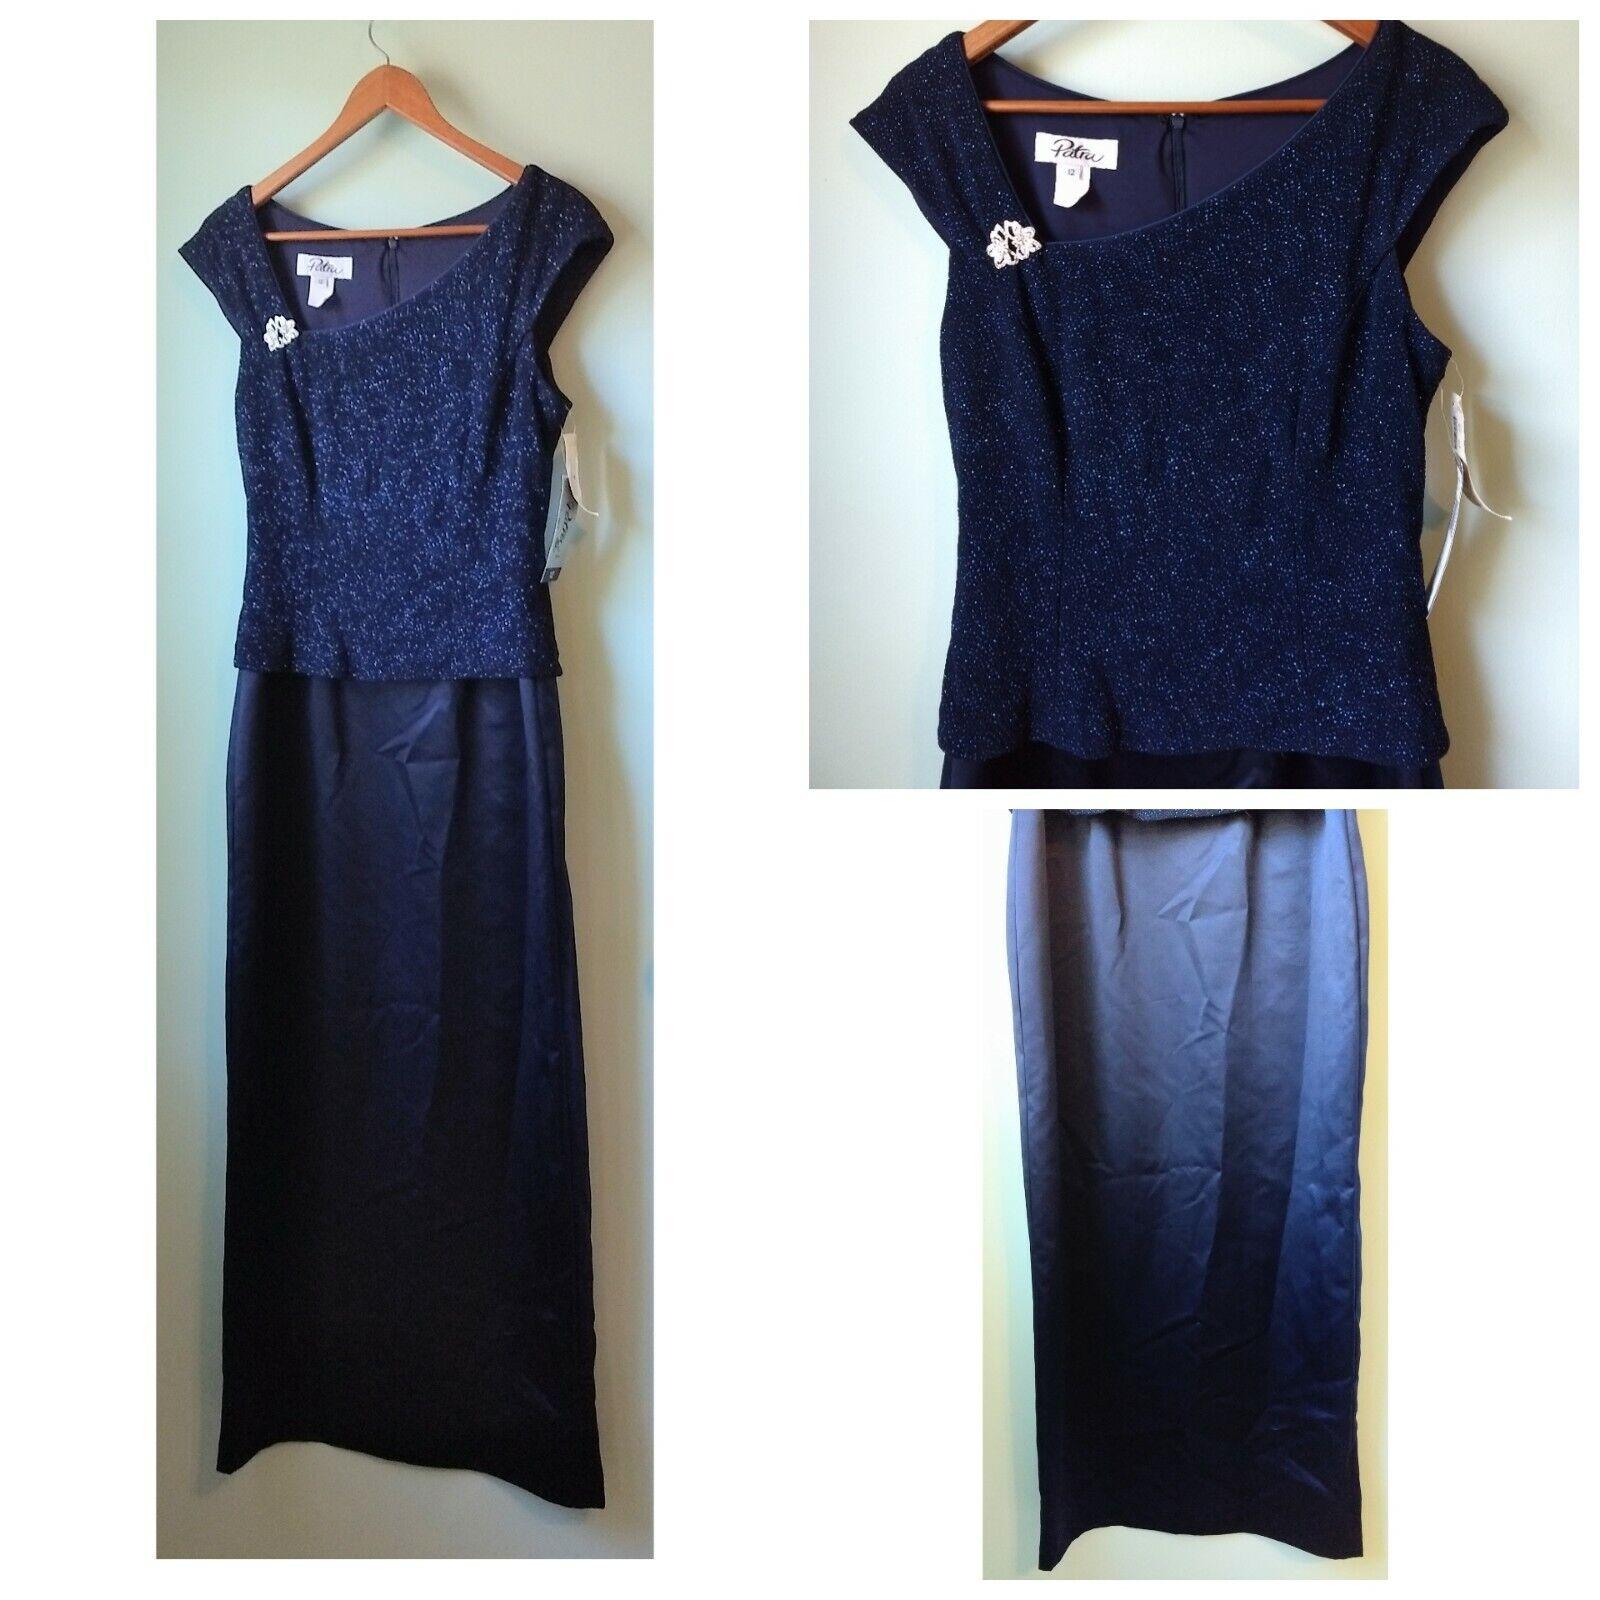 Patra navy bluee Dress Size 12 Sparkle formal long satin dress fitted wedding